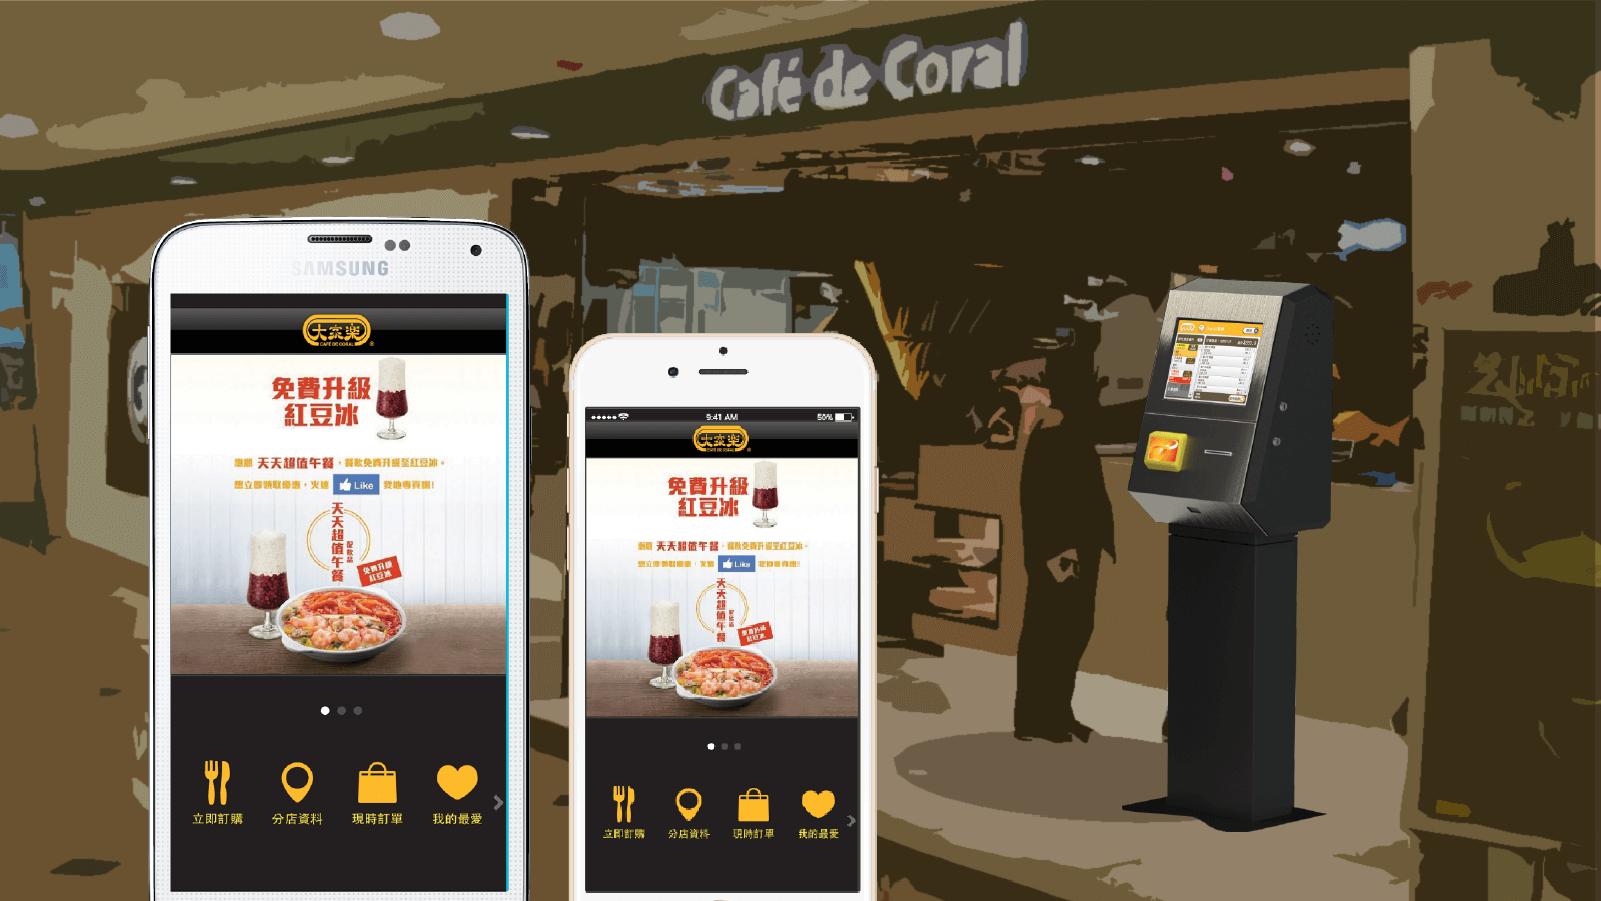 legato portfolio Cafe de Coral